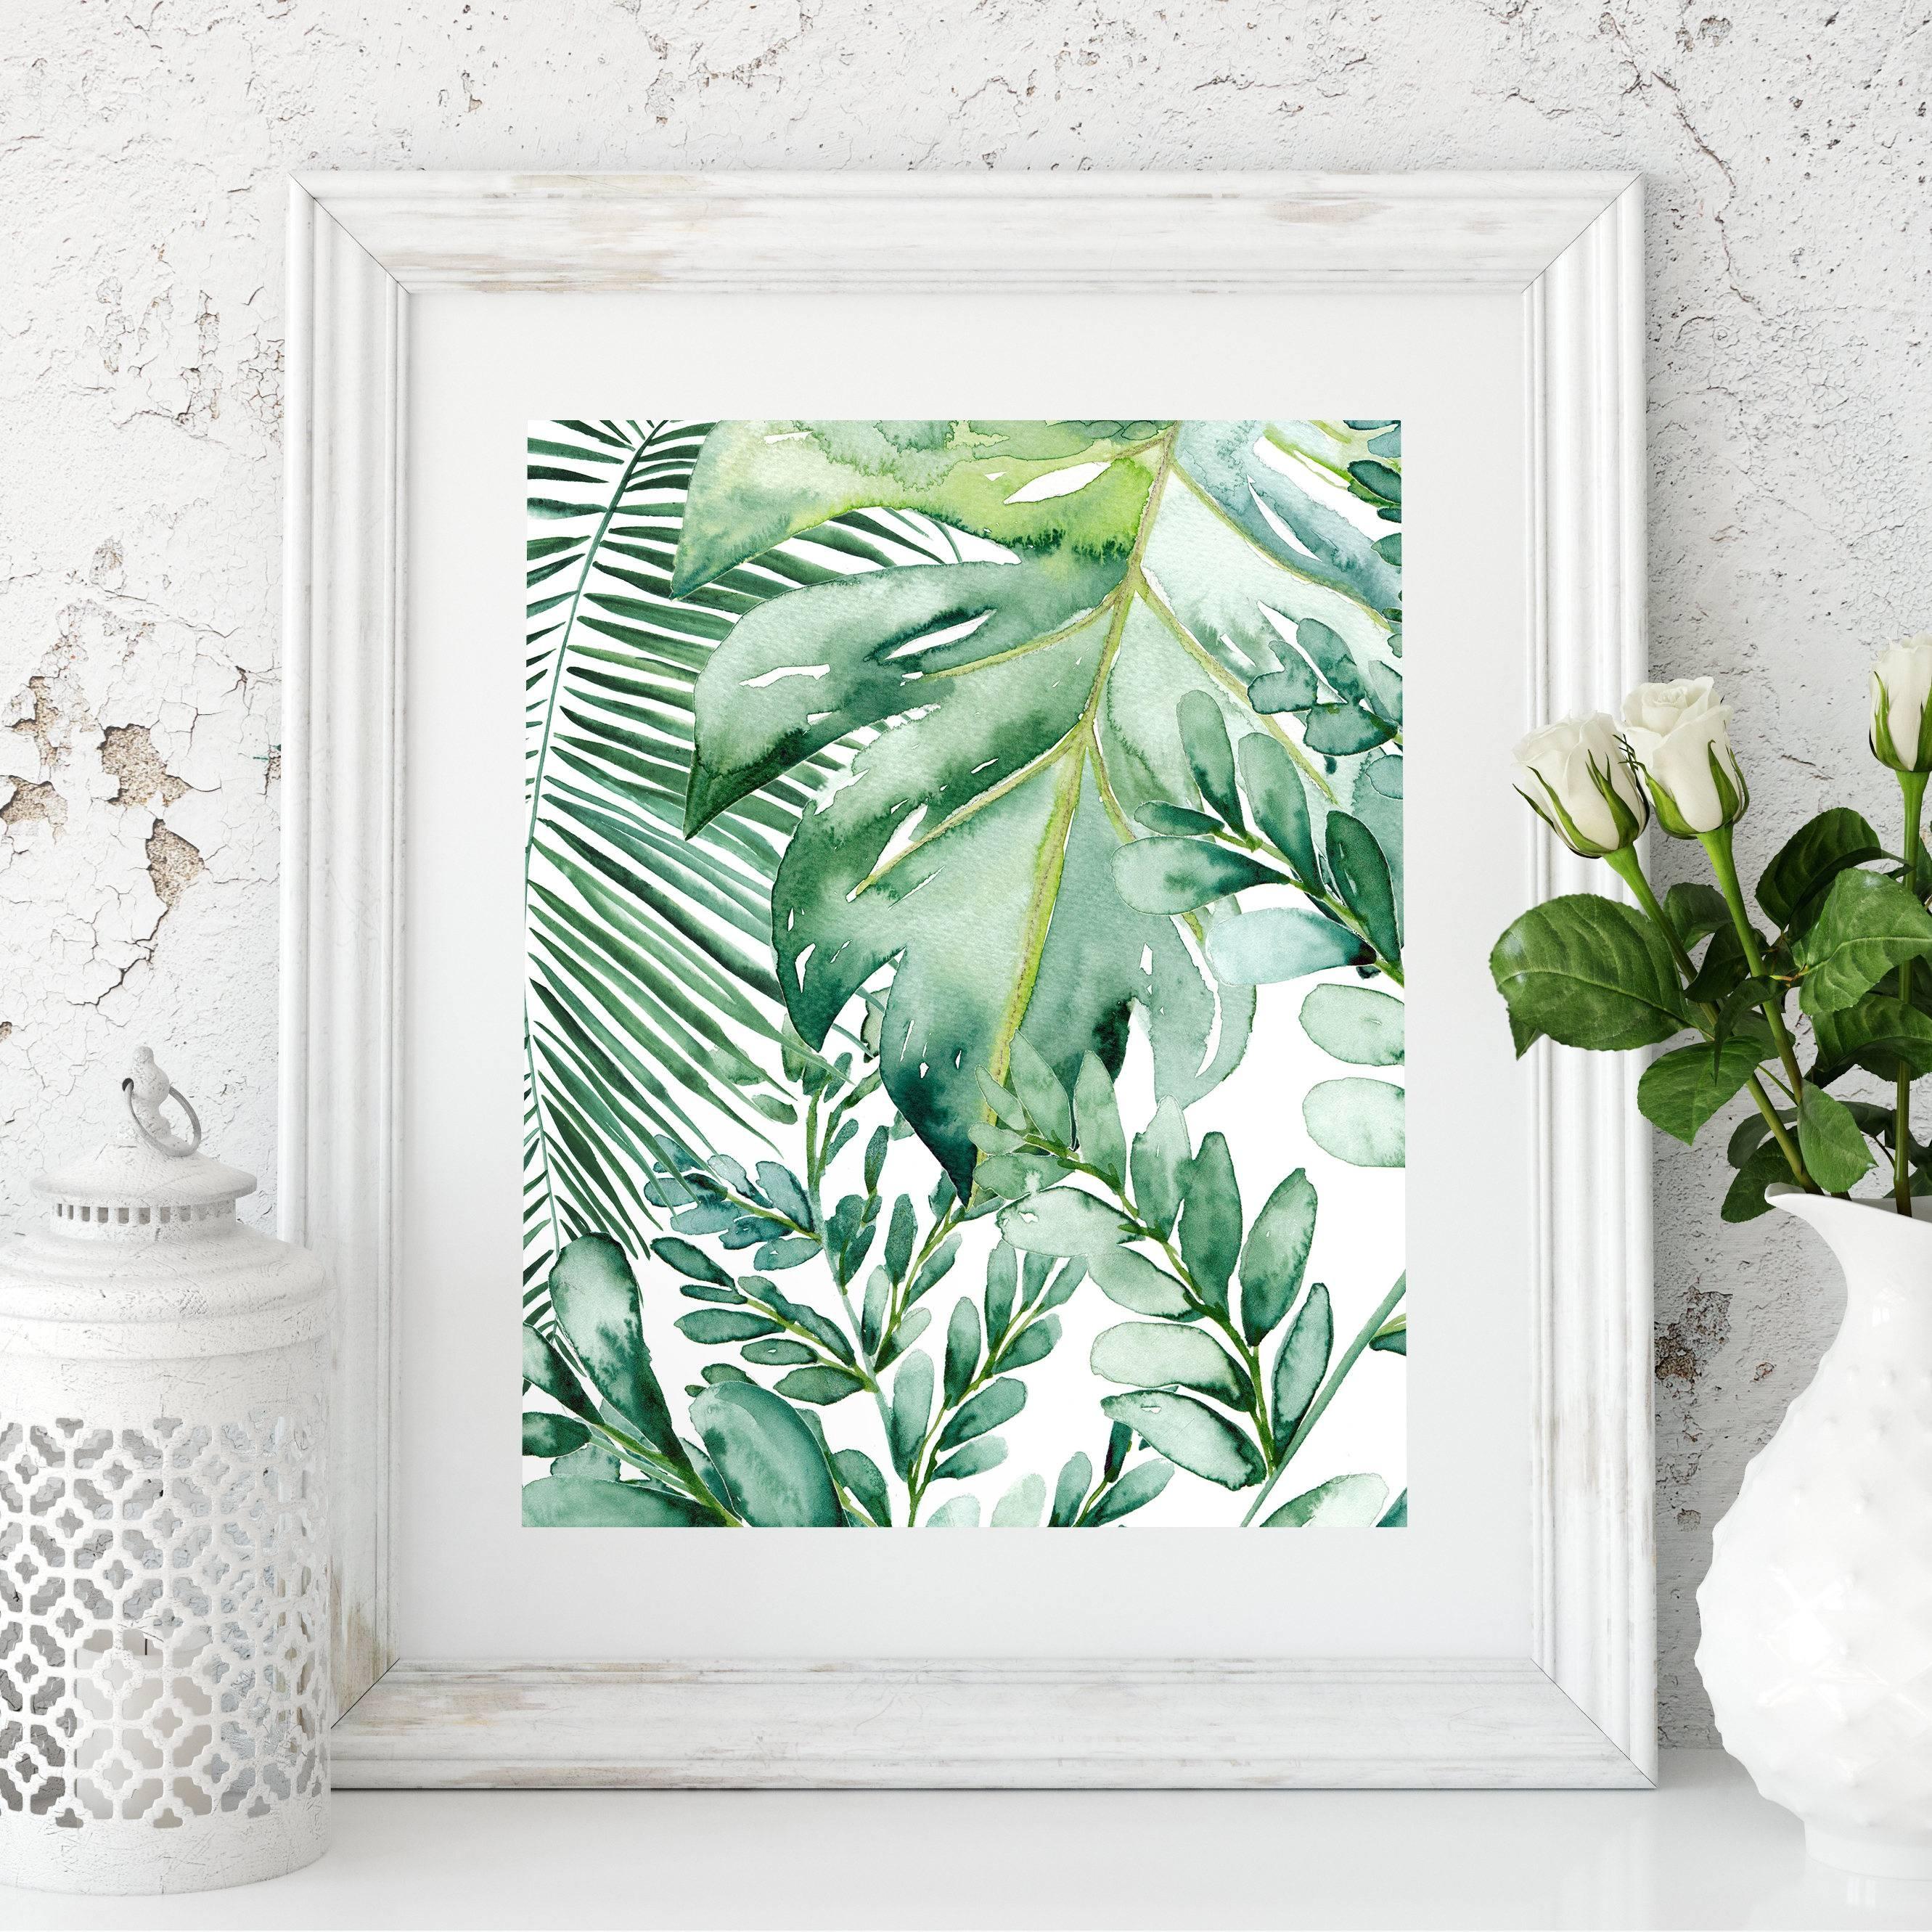 Banana Leaf Wall Art Banana Leaf Decor Palm Leaf Art Print Intended For Current Palm Leaf Wall Art (View 6 of 20)